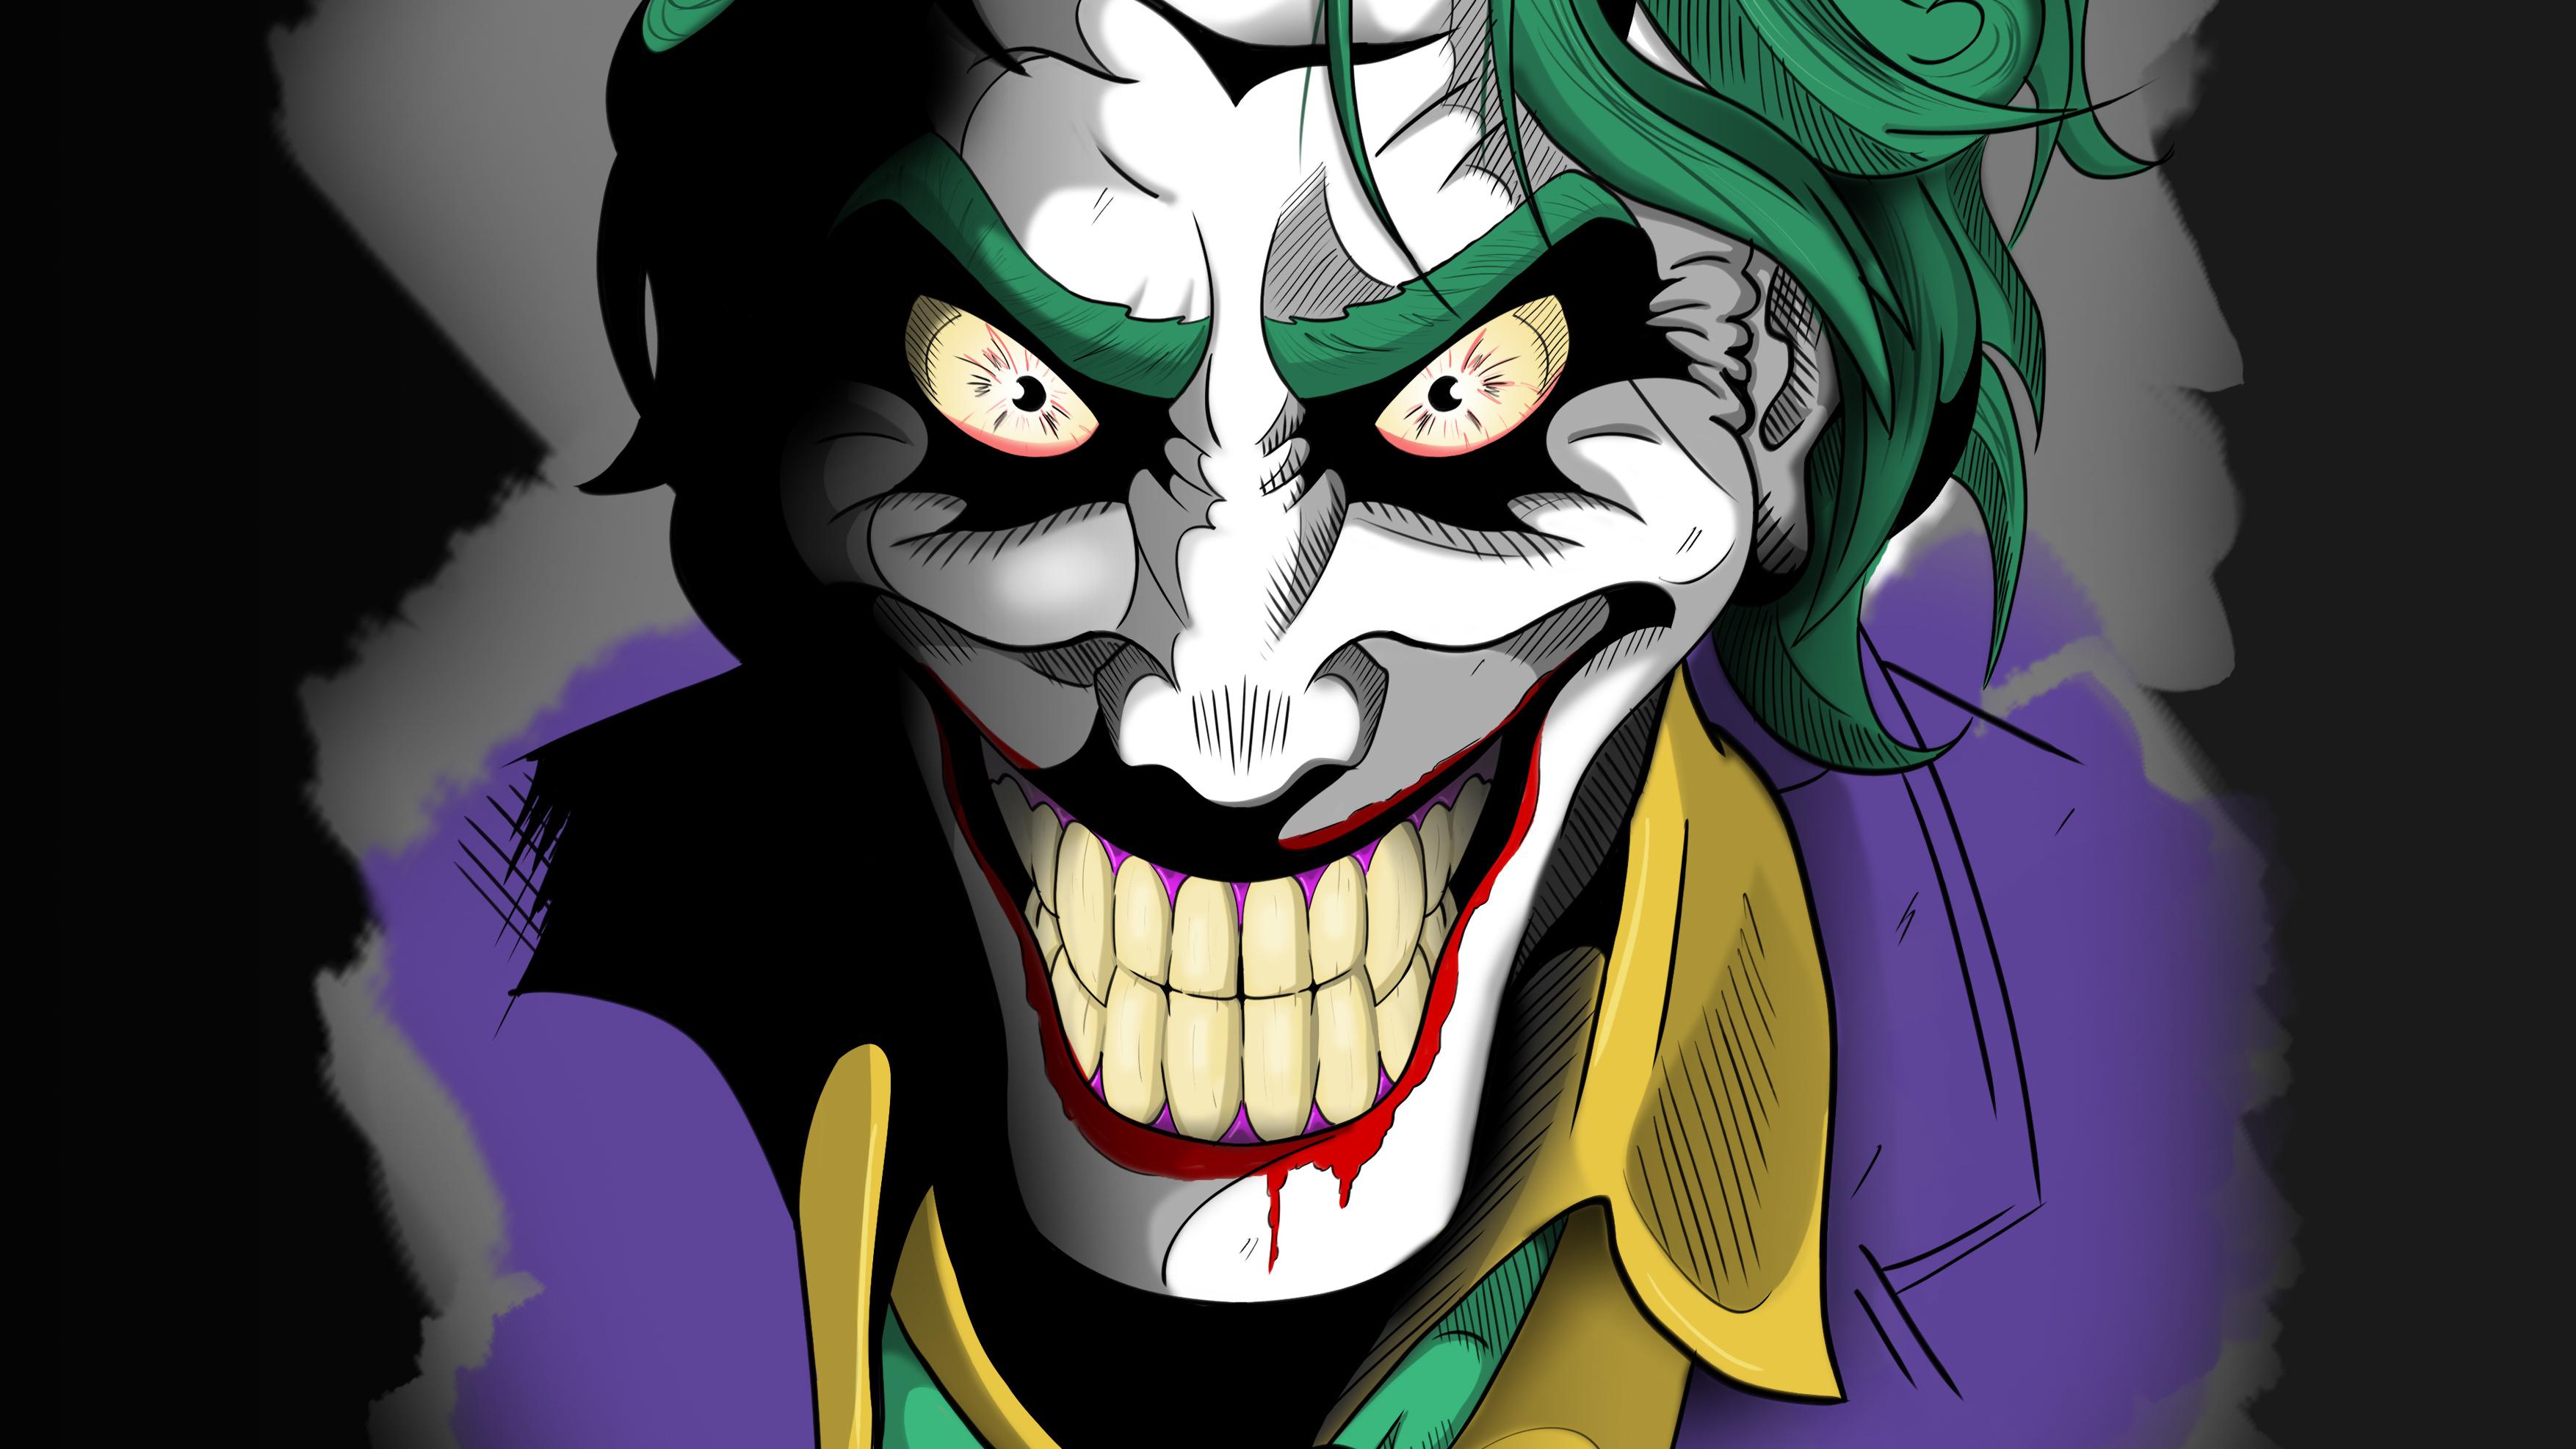 Joker Art 4k 2019, HD Superheroes, 4k Wallpapers, Images ...